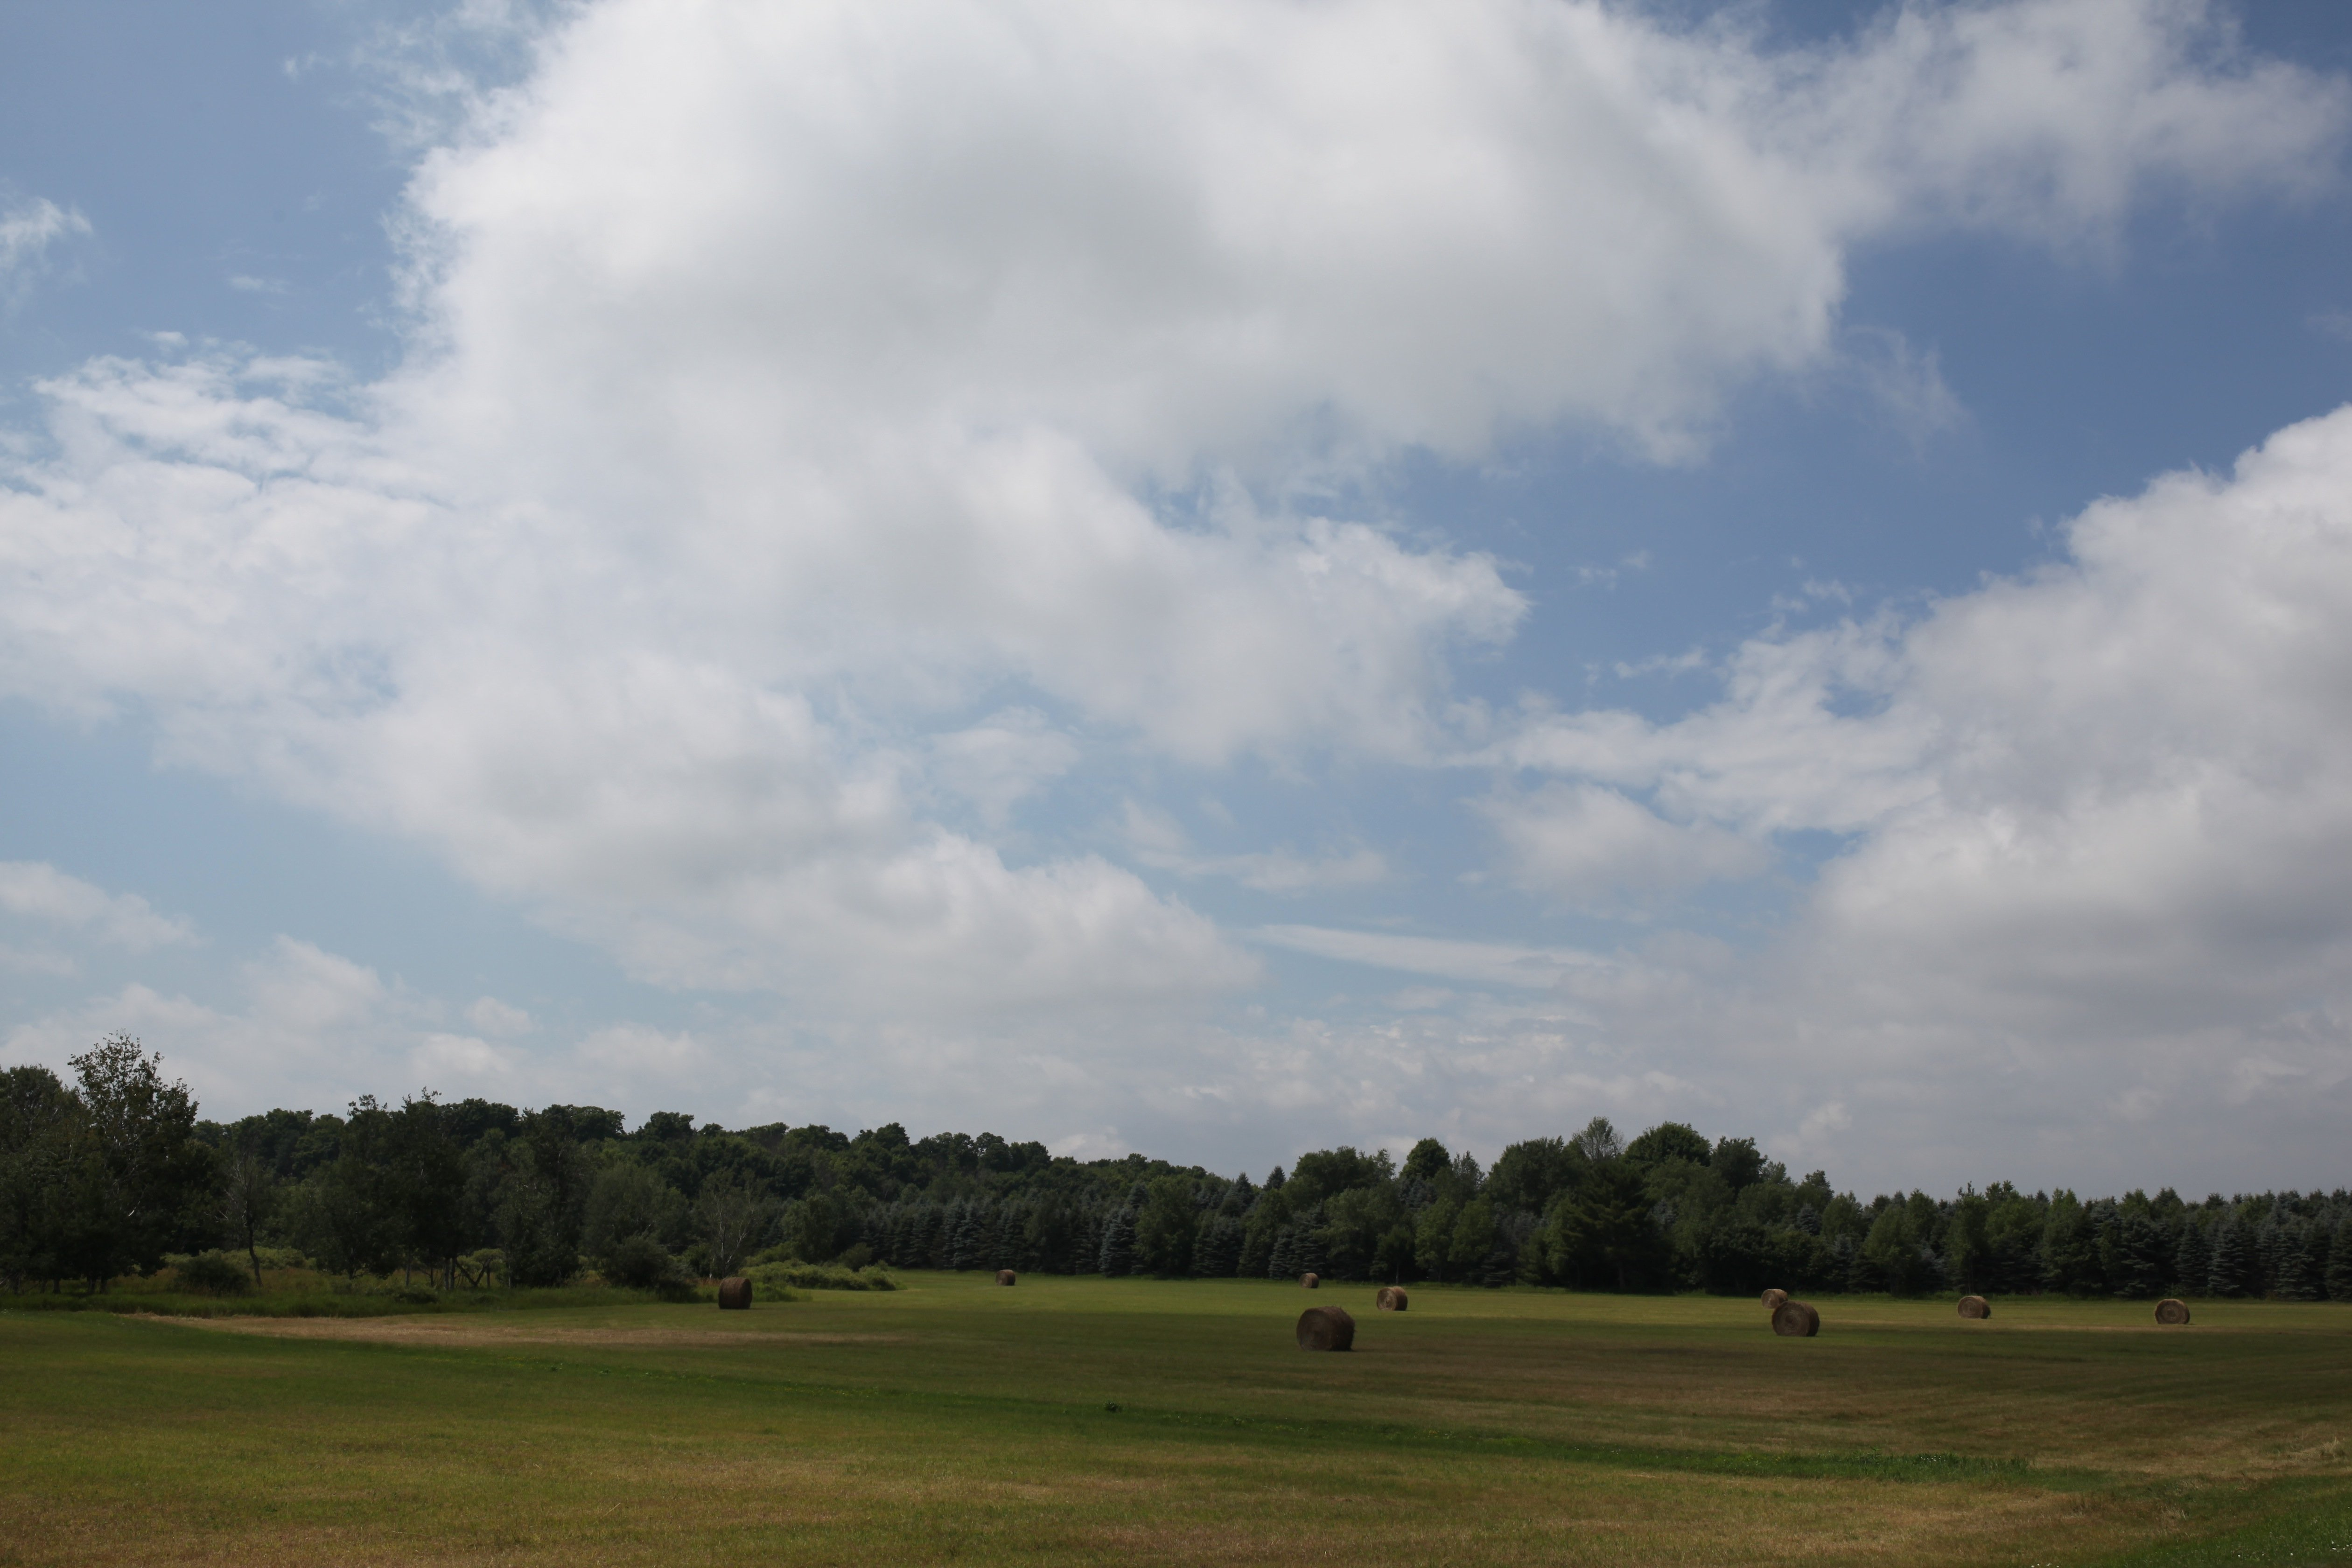 round bale field in N Mich